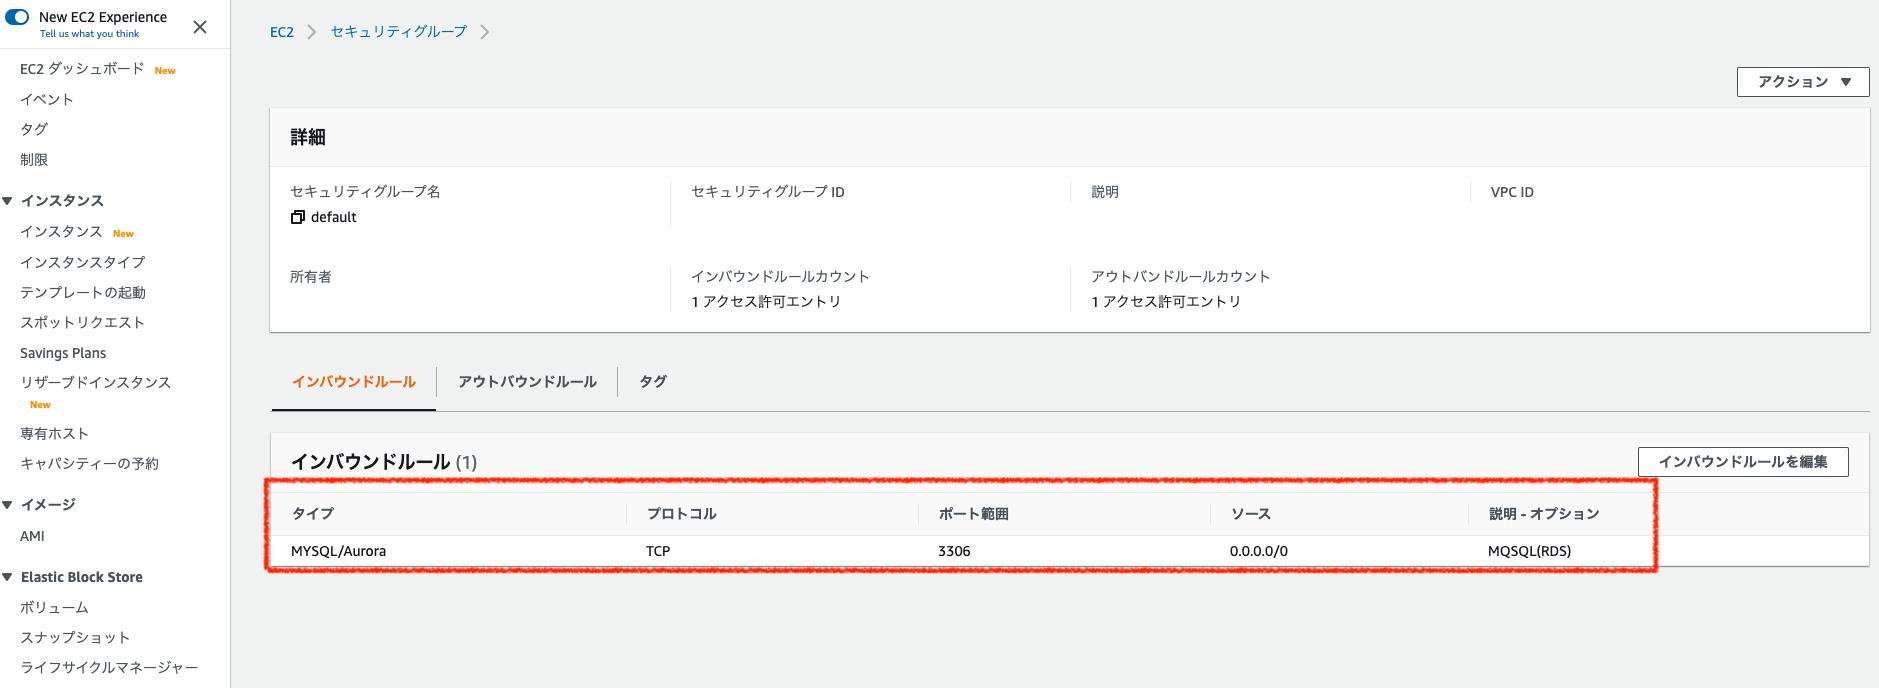 Screenshot-2021-06-06-20.47.46-1